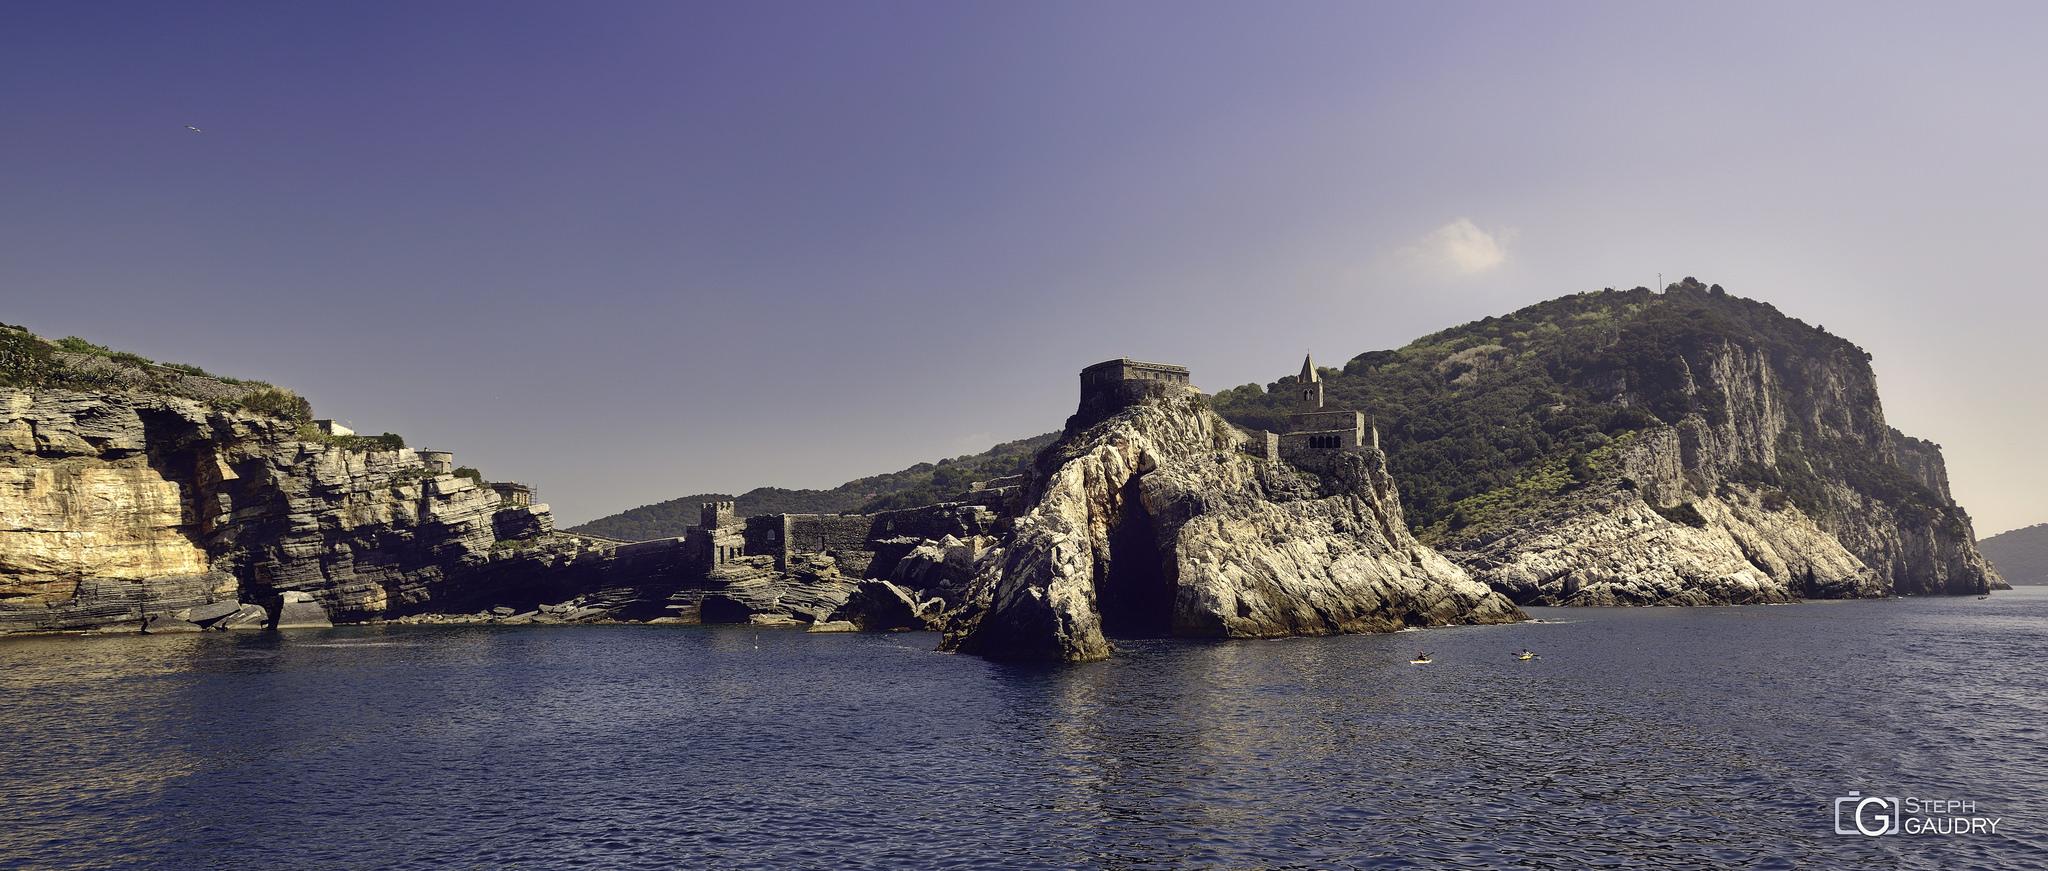 Porto Venere - Chiesa di San Pietro - panorama [Click to start slideshow]